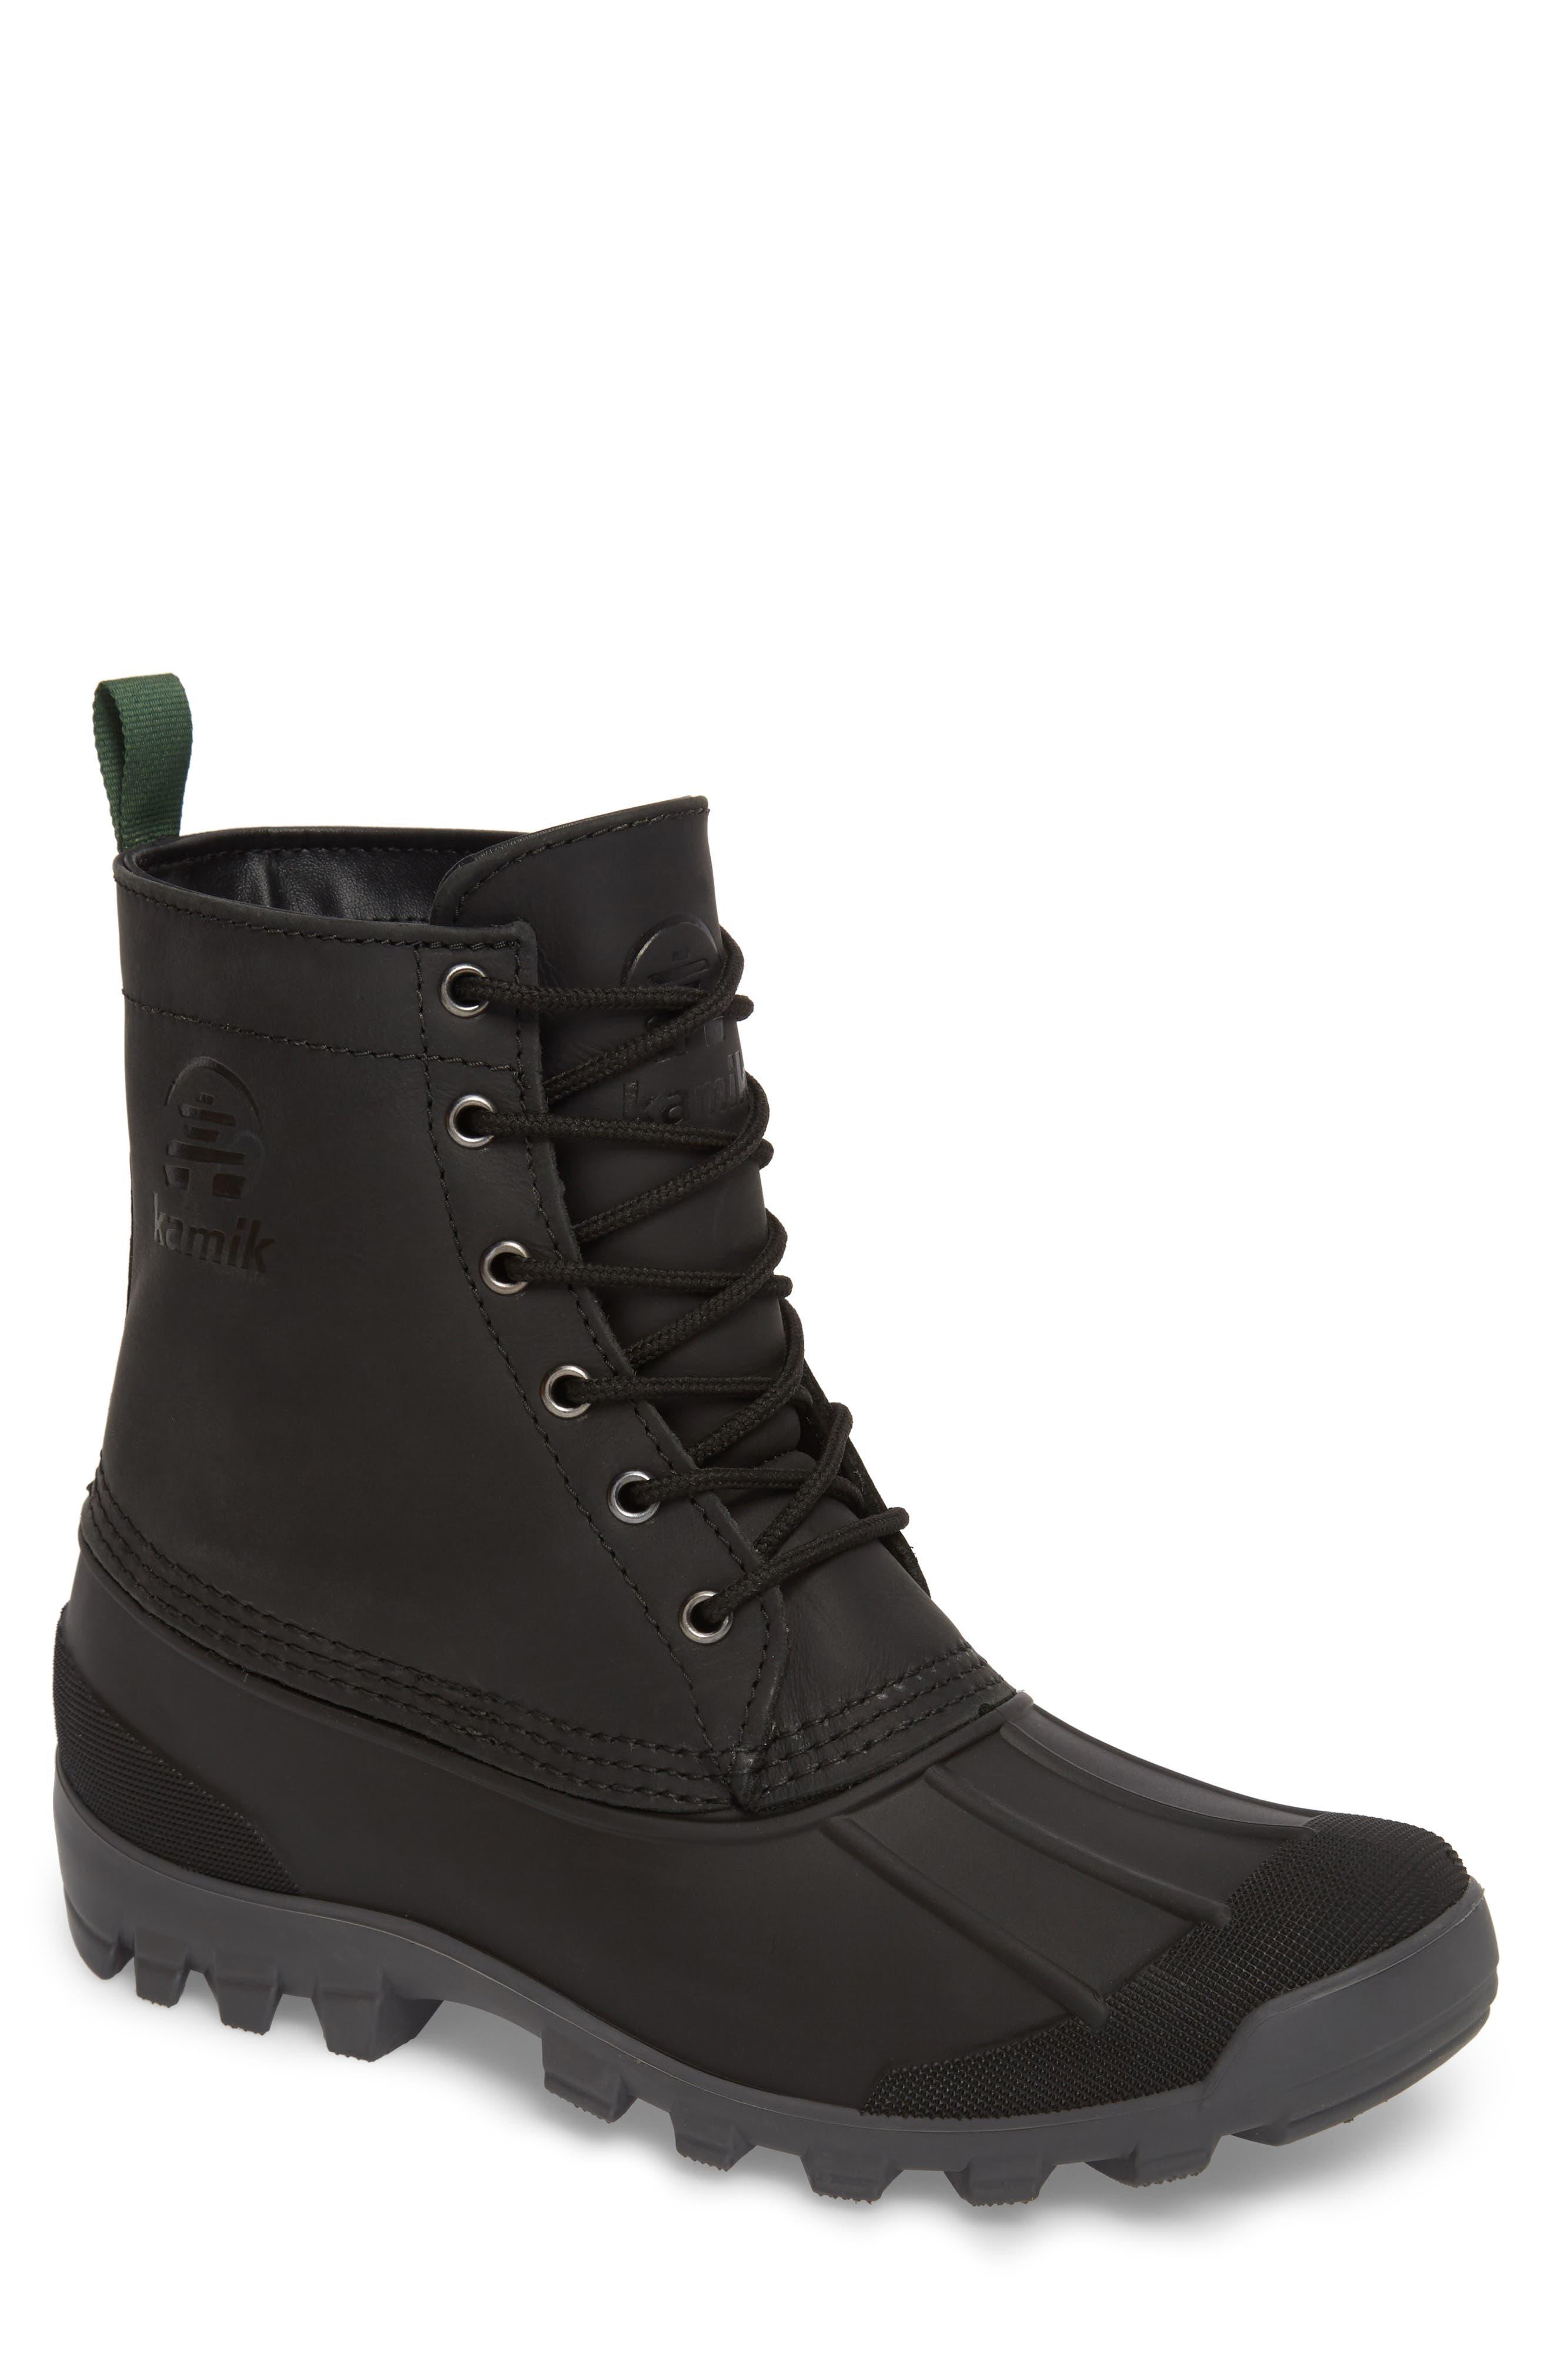 Alternate Image 1 Selected - Kamik Yukon 6 Waterproof Insulated Three-Season Boot (Men)